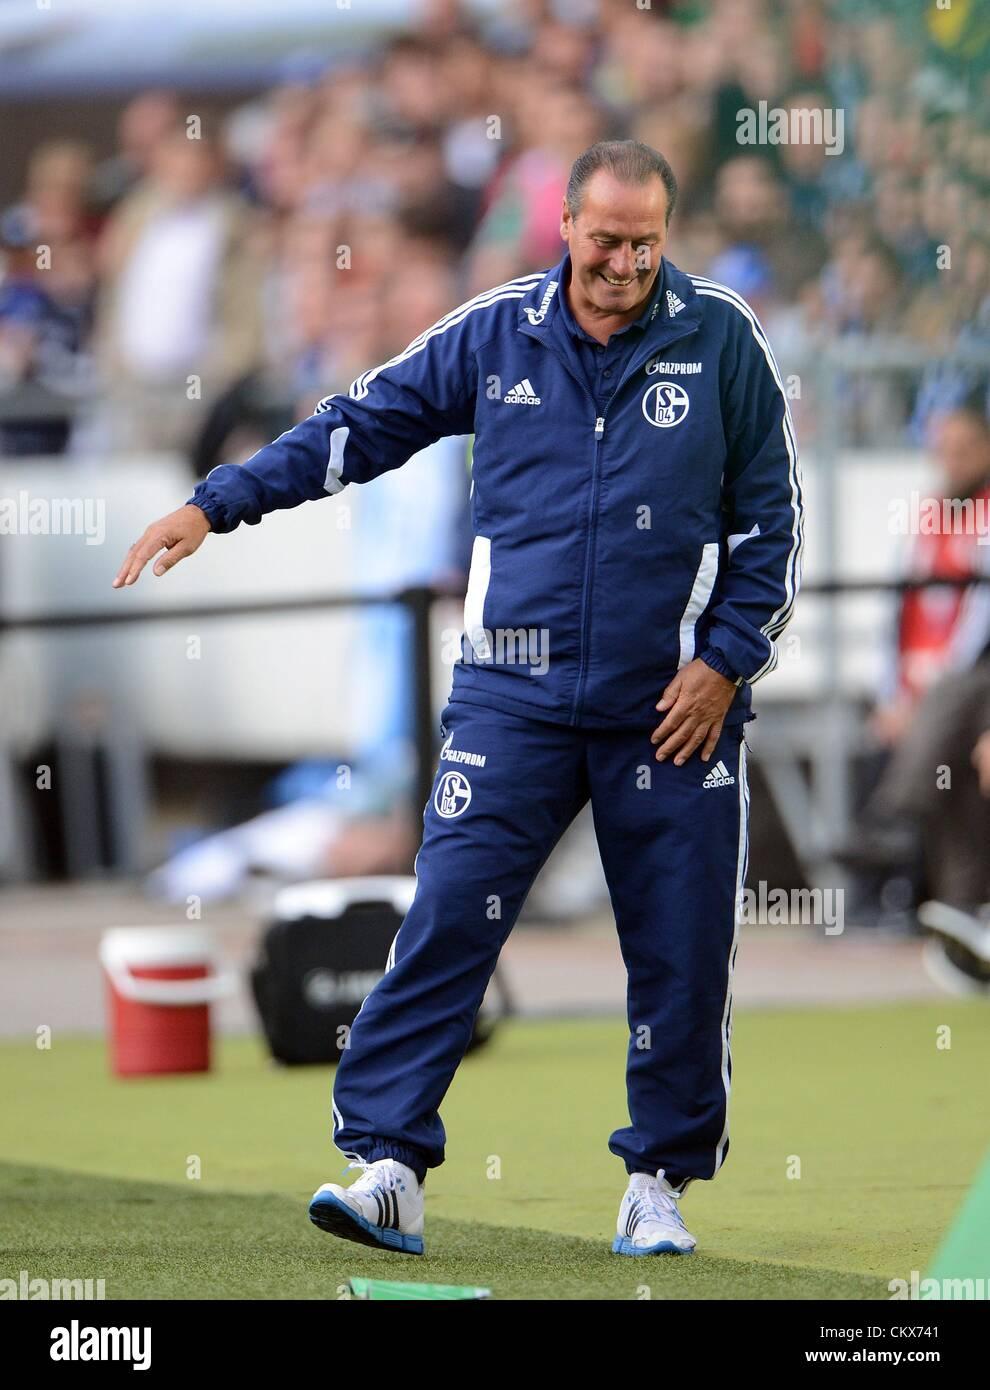 26 August 2012. Hanover, Germany. Schalke's head coach Huub Stevens gestures at the sideline during the Bundesliga - Stock Image